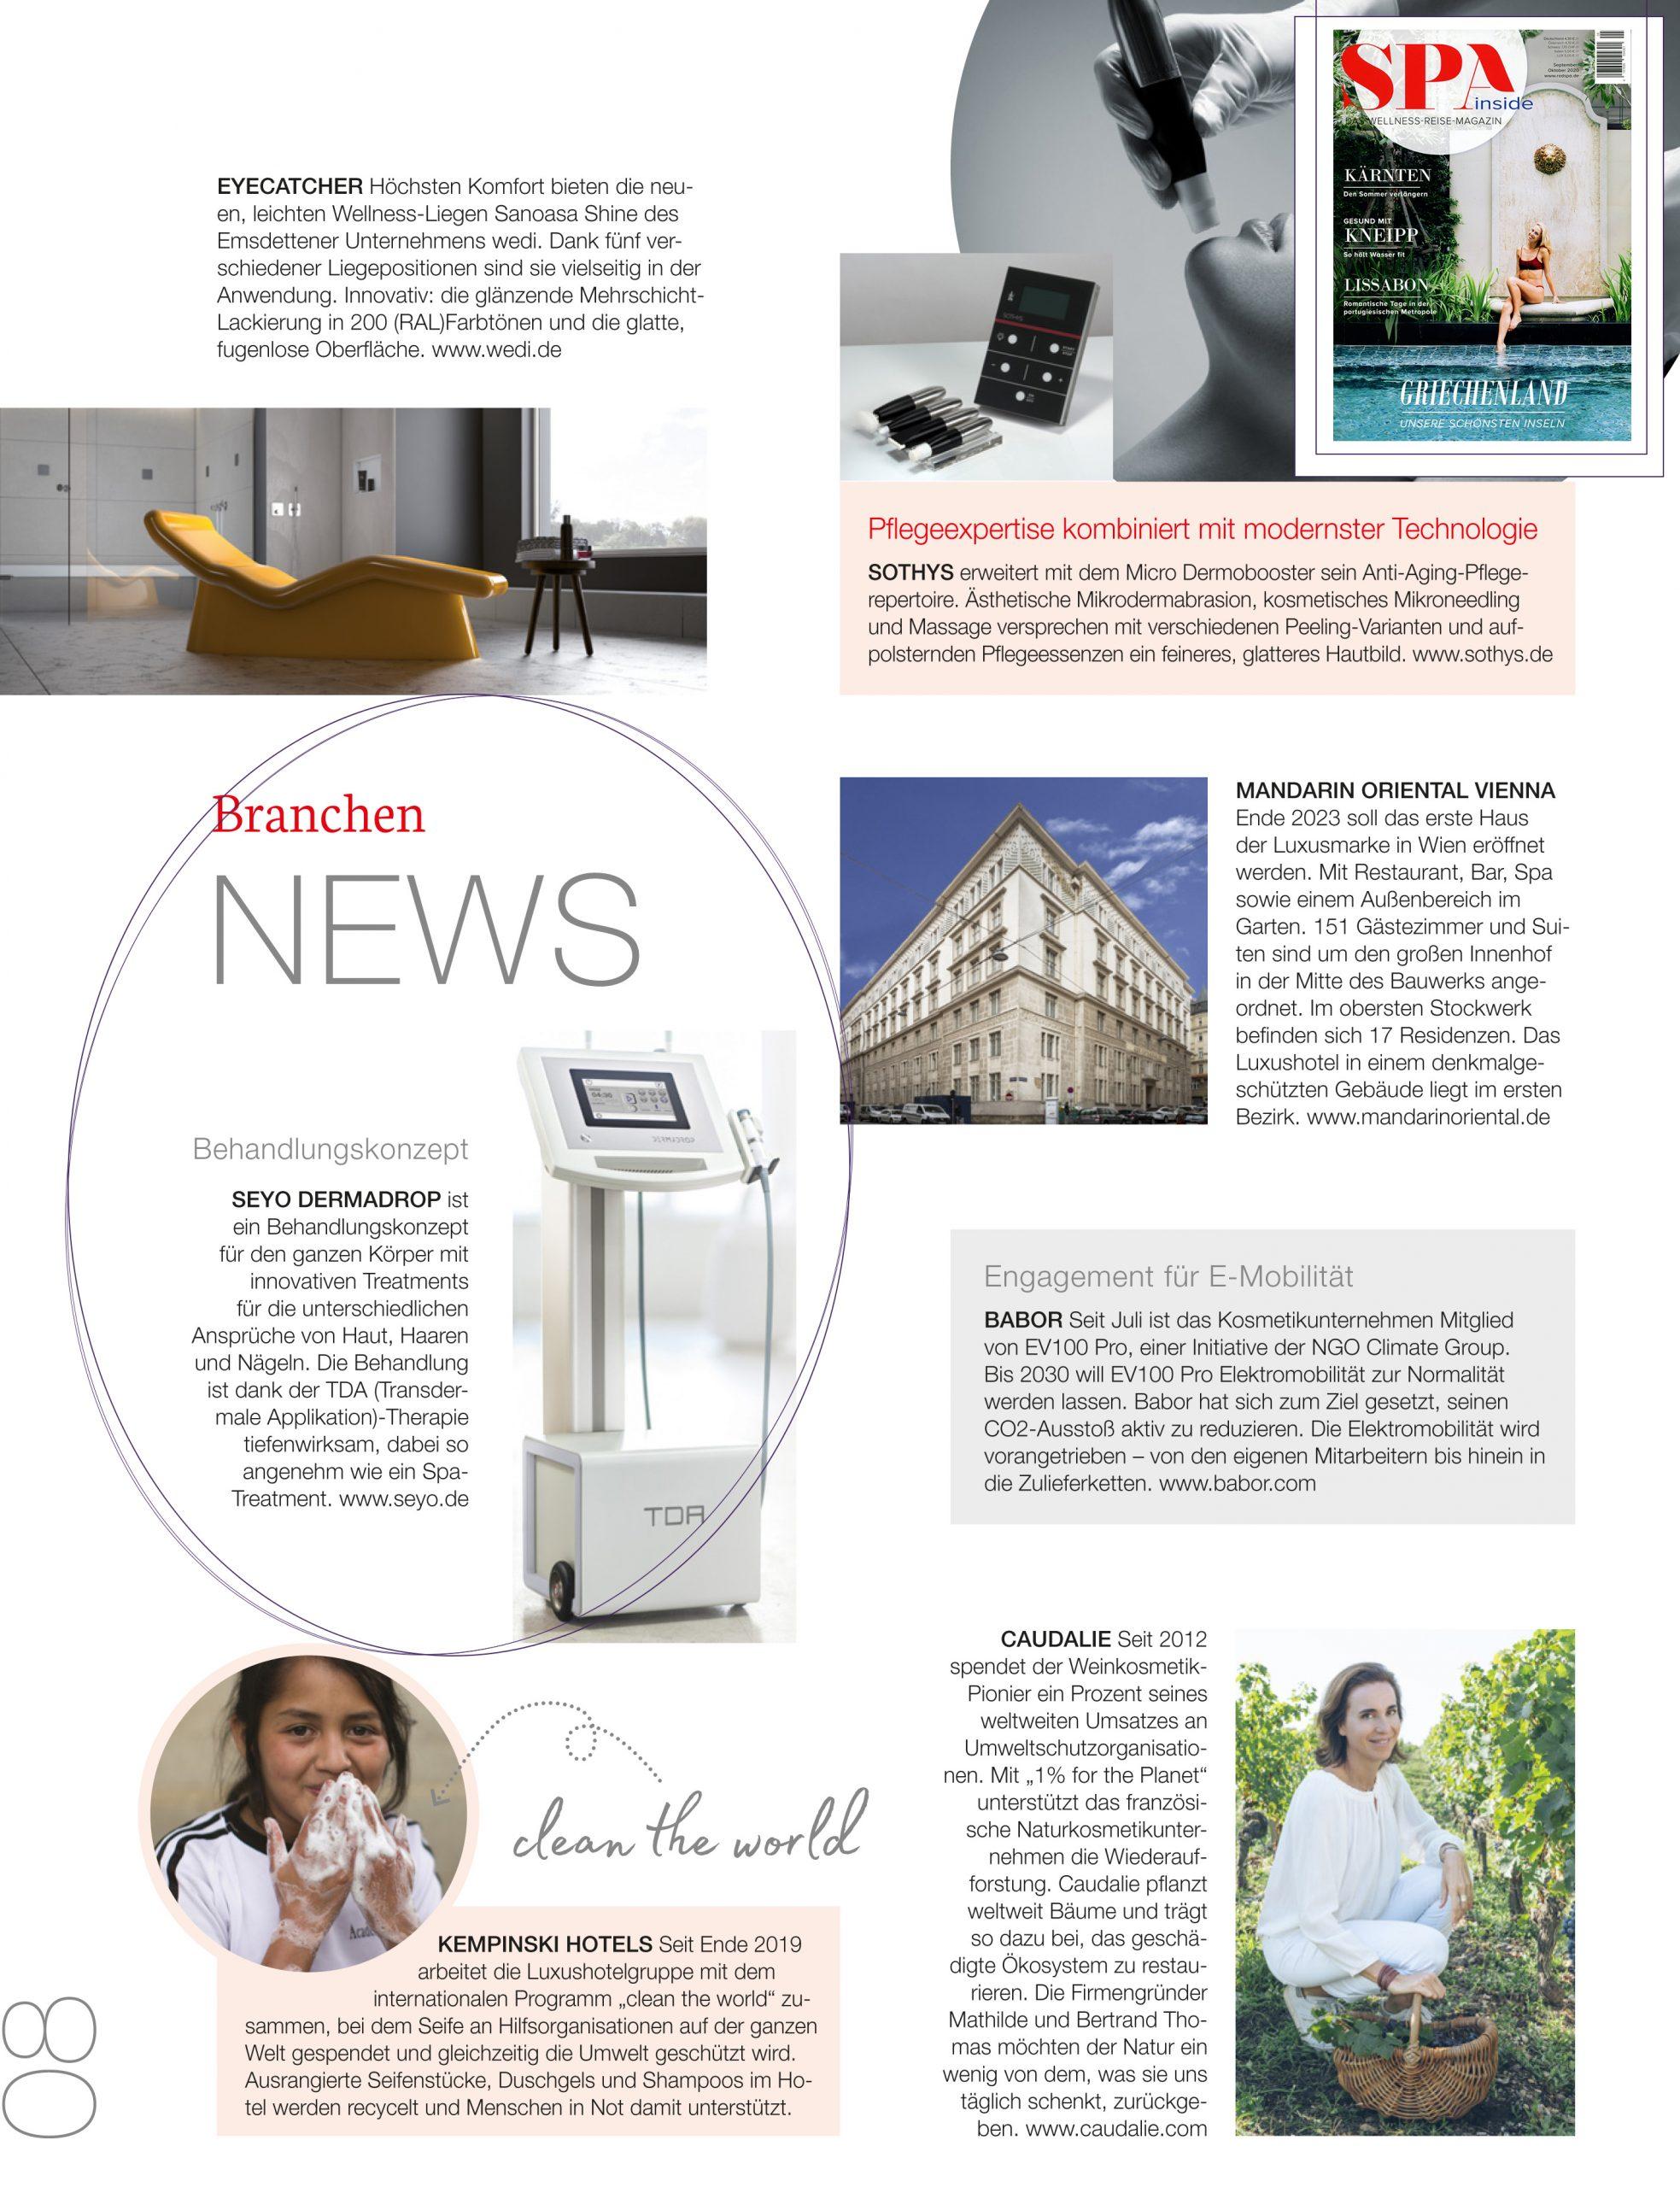 SPA Inside Publication DERMADROP